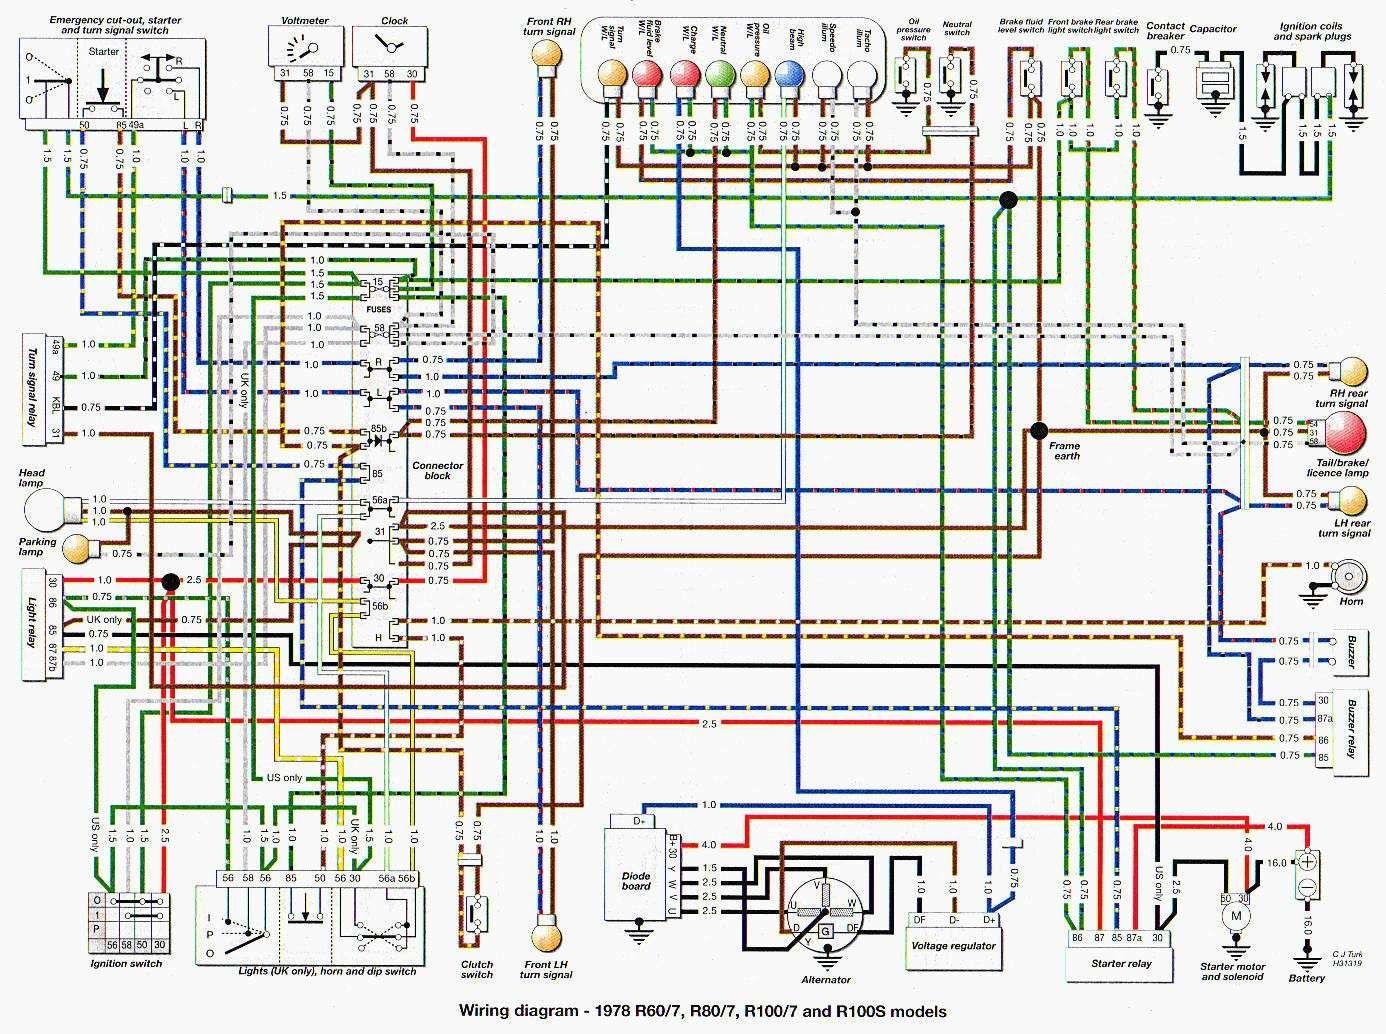 wiring diagram 2008 bmw k1200 wiring diagram bmw k1200rs, gt & lt 1998 2008 (clymer